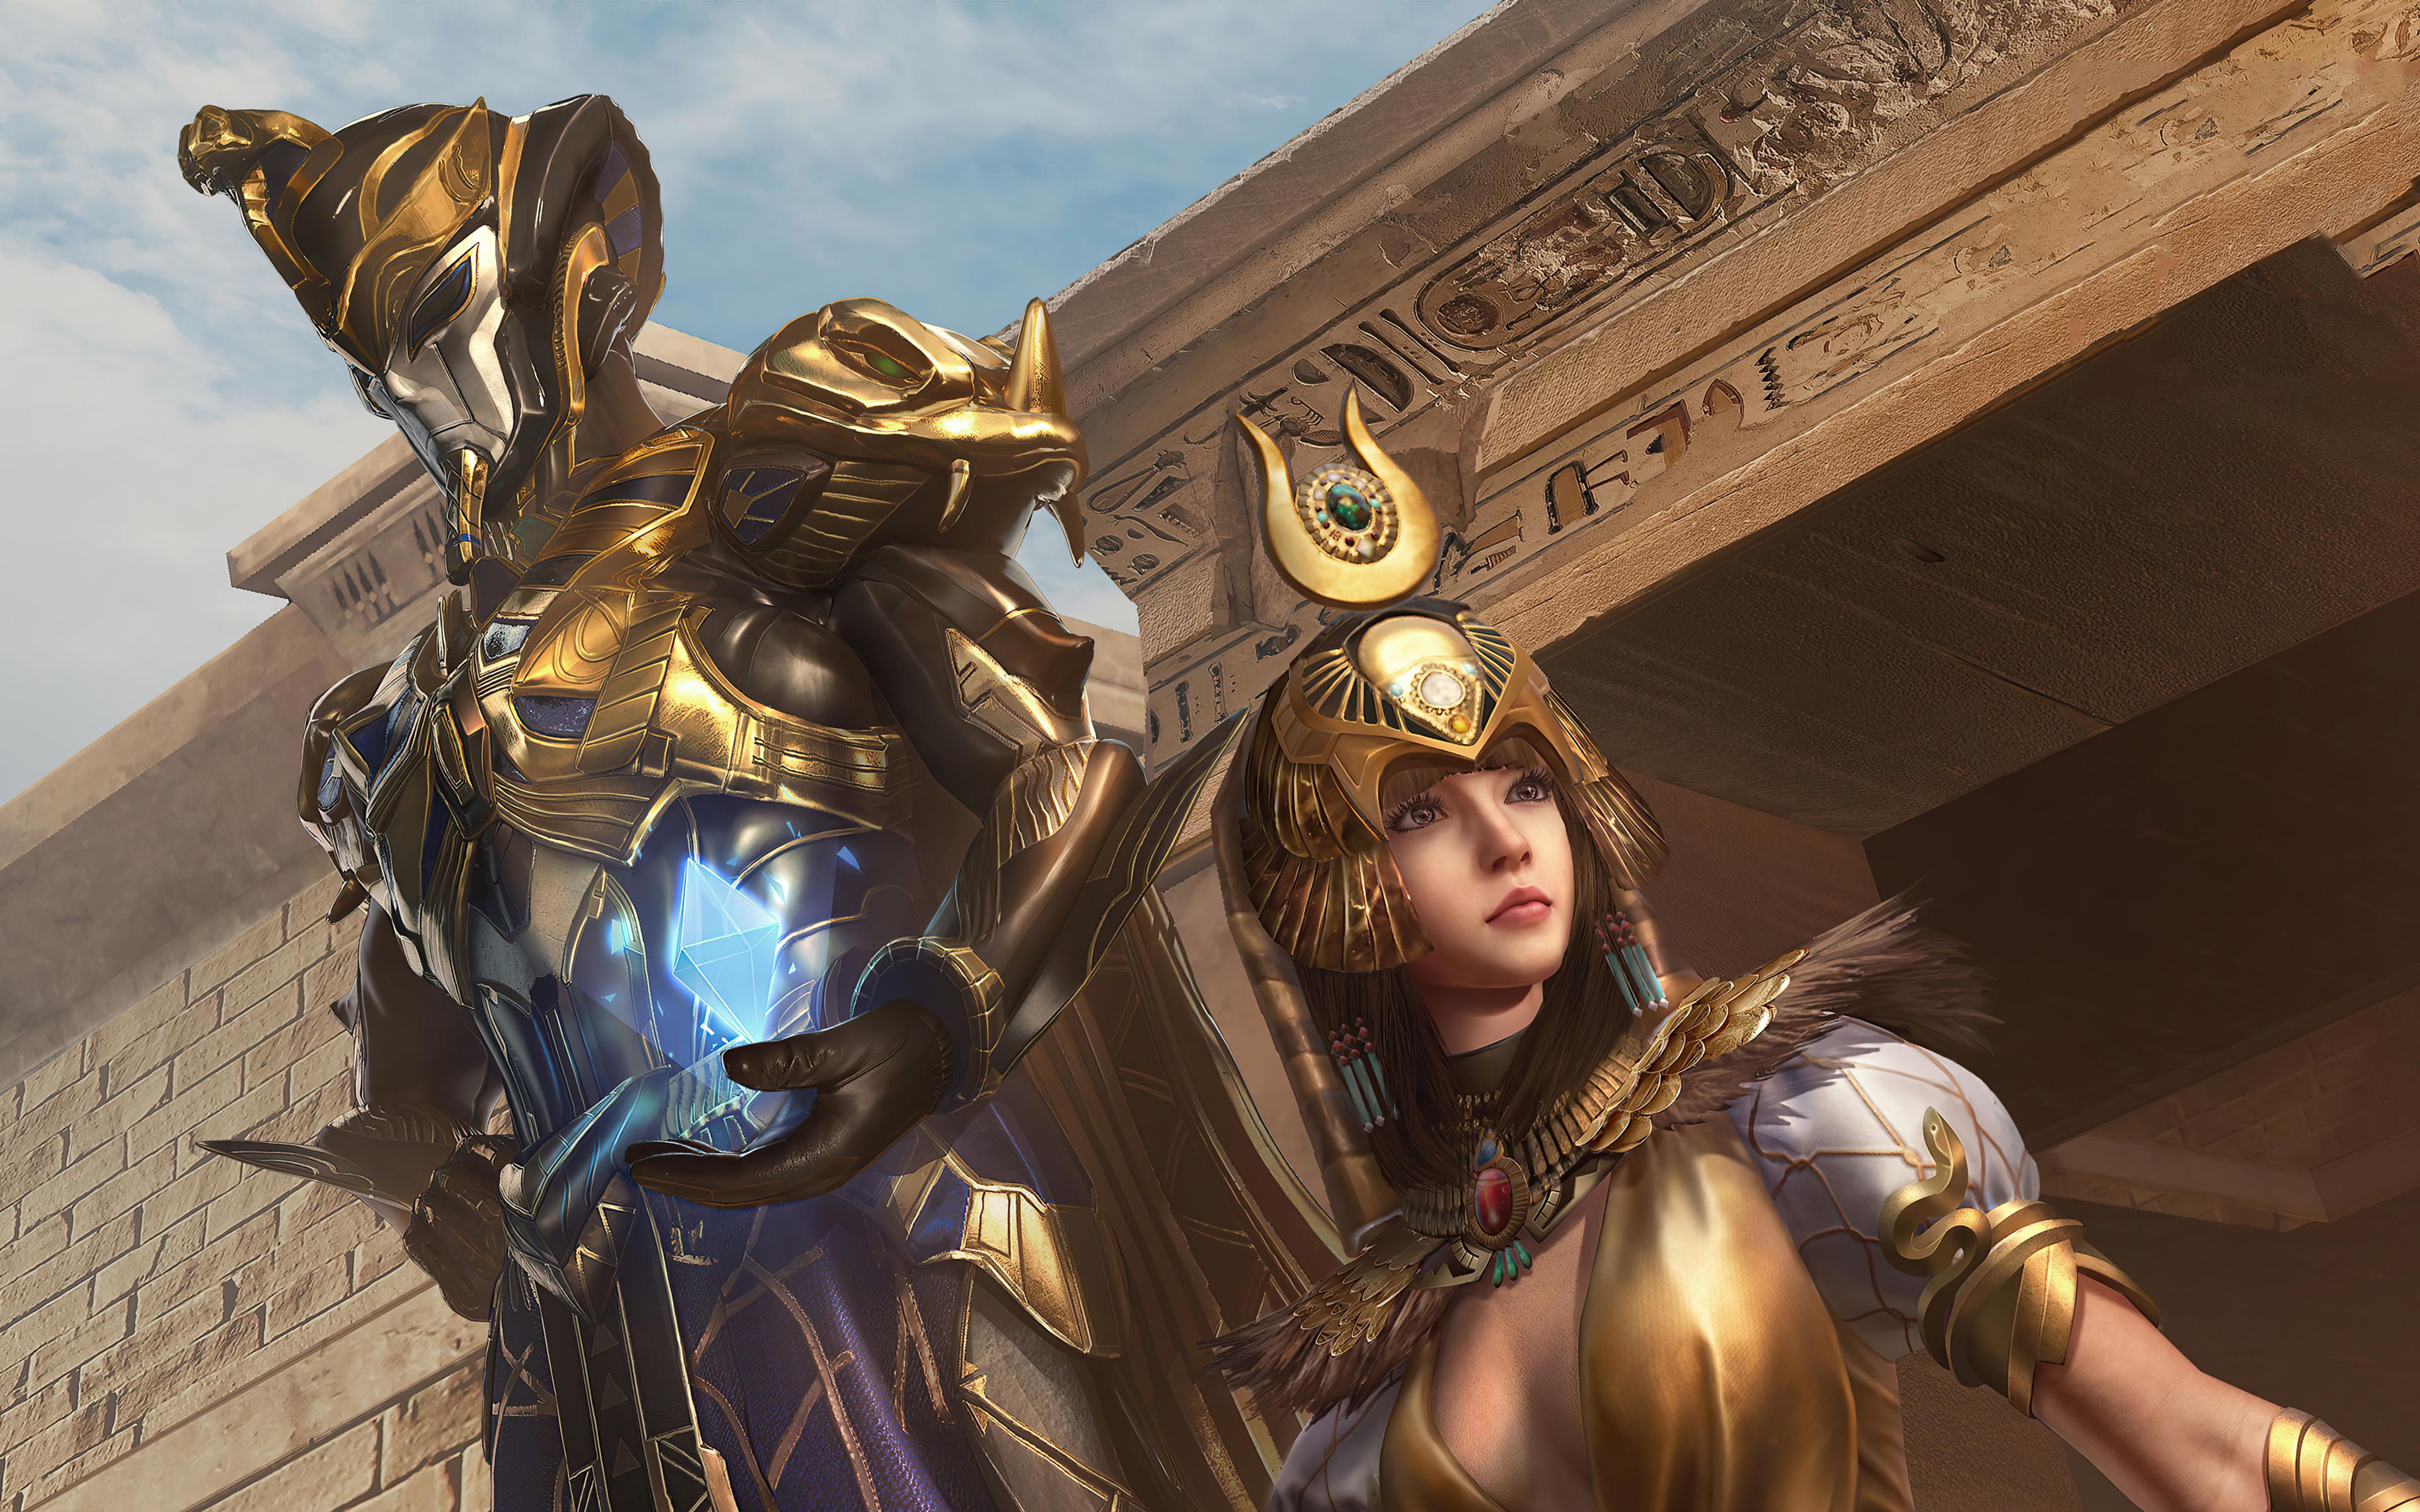 3840x2400 Golden Pharaoh X Suit Pubg 4k HD 4k Wallpapers ...